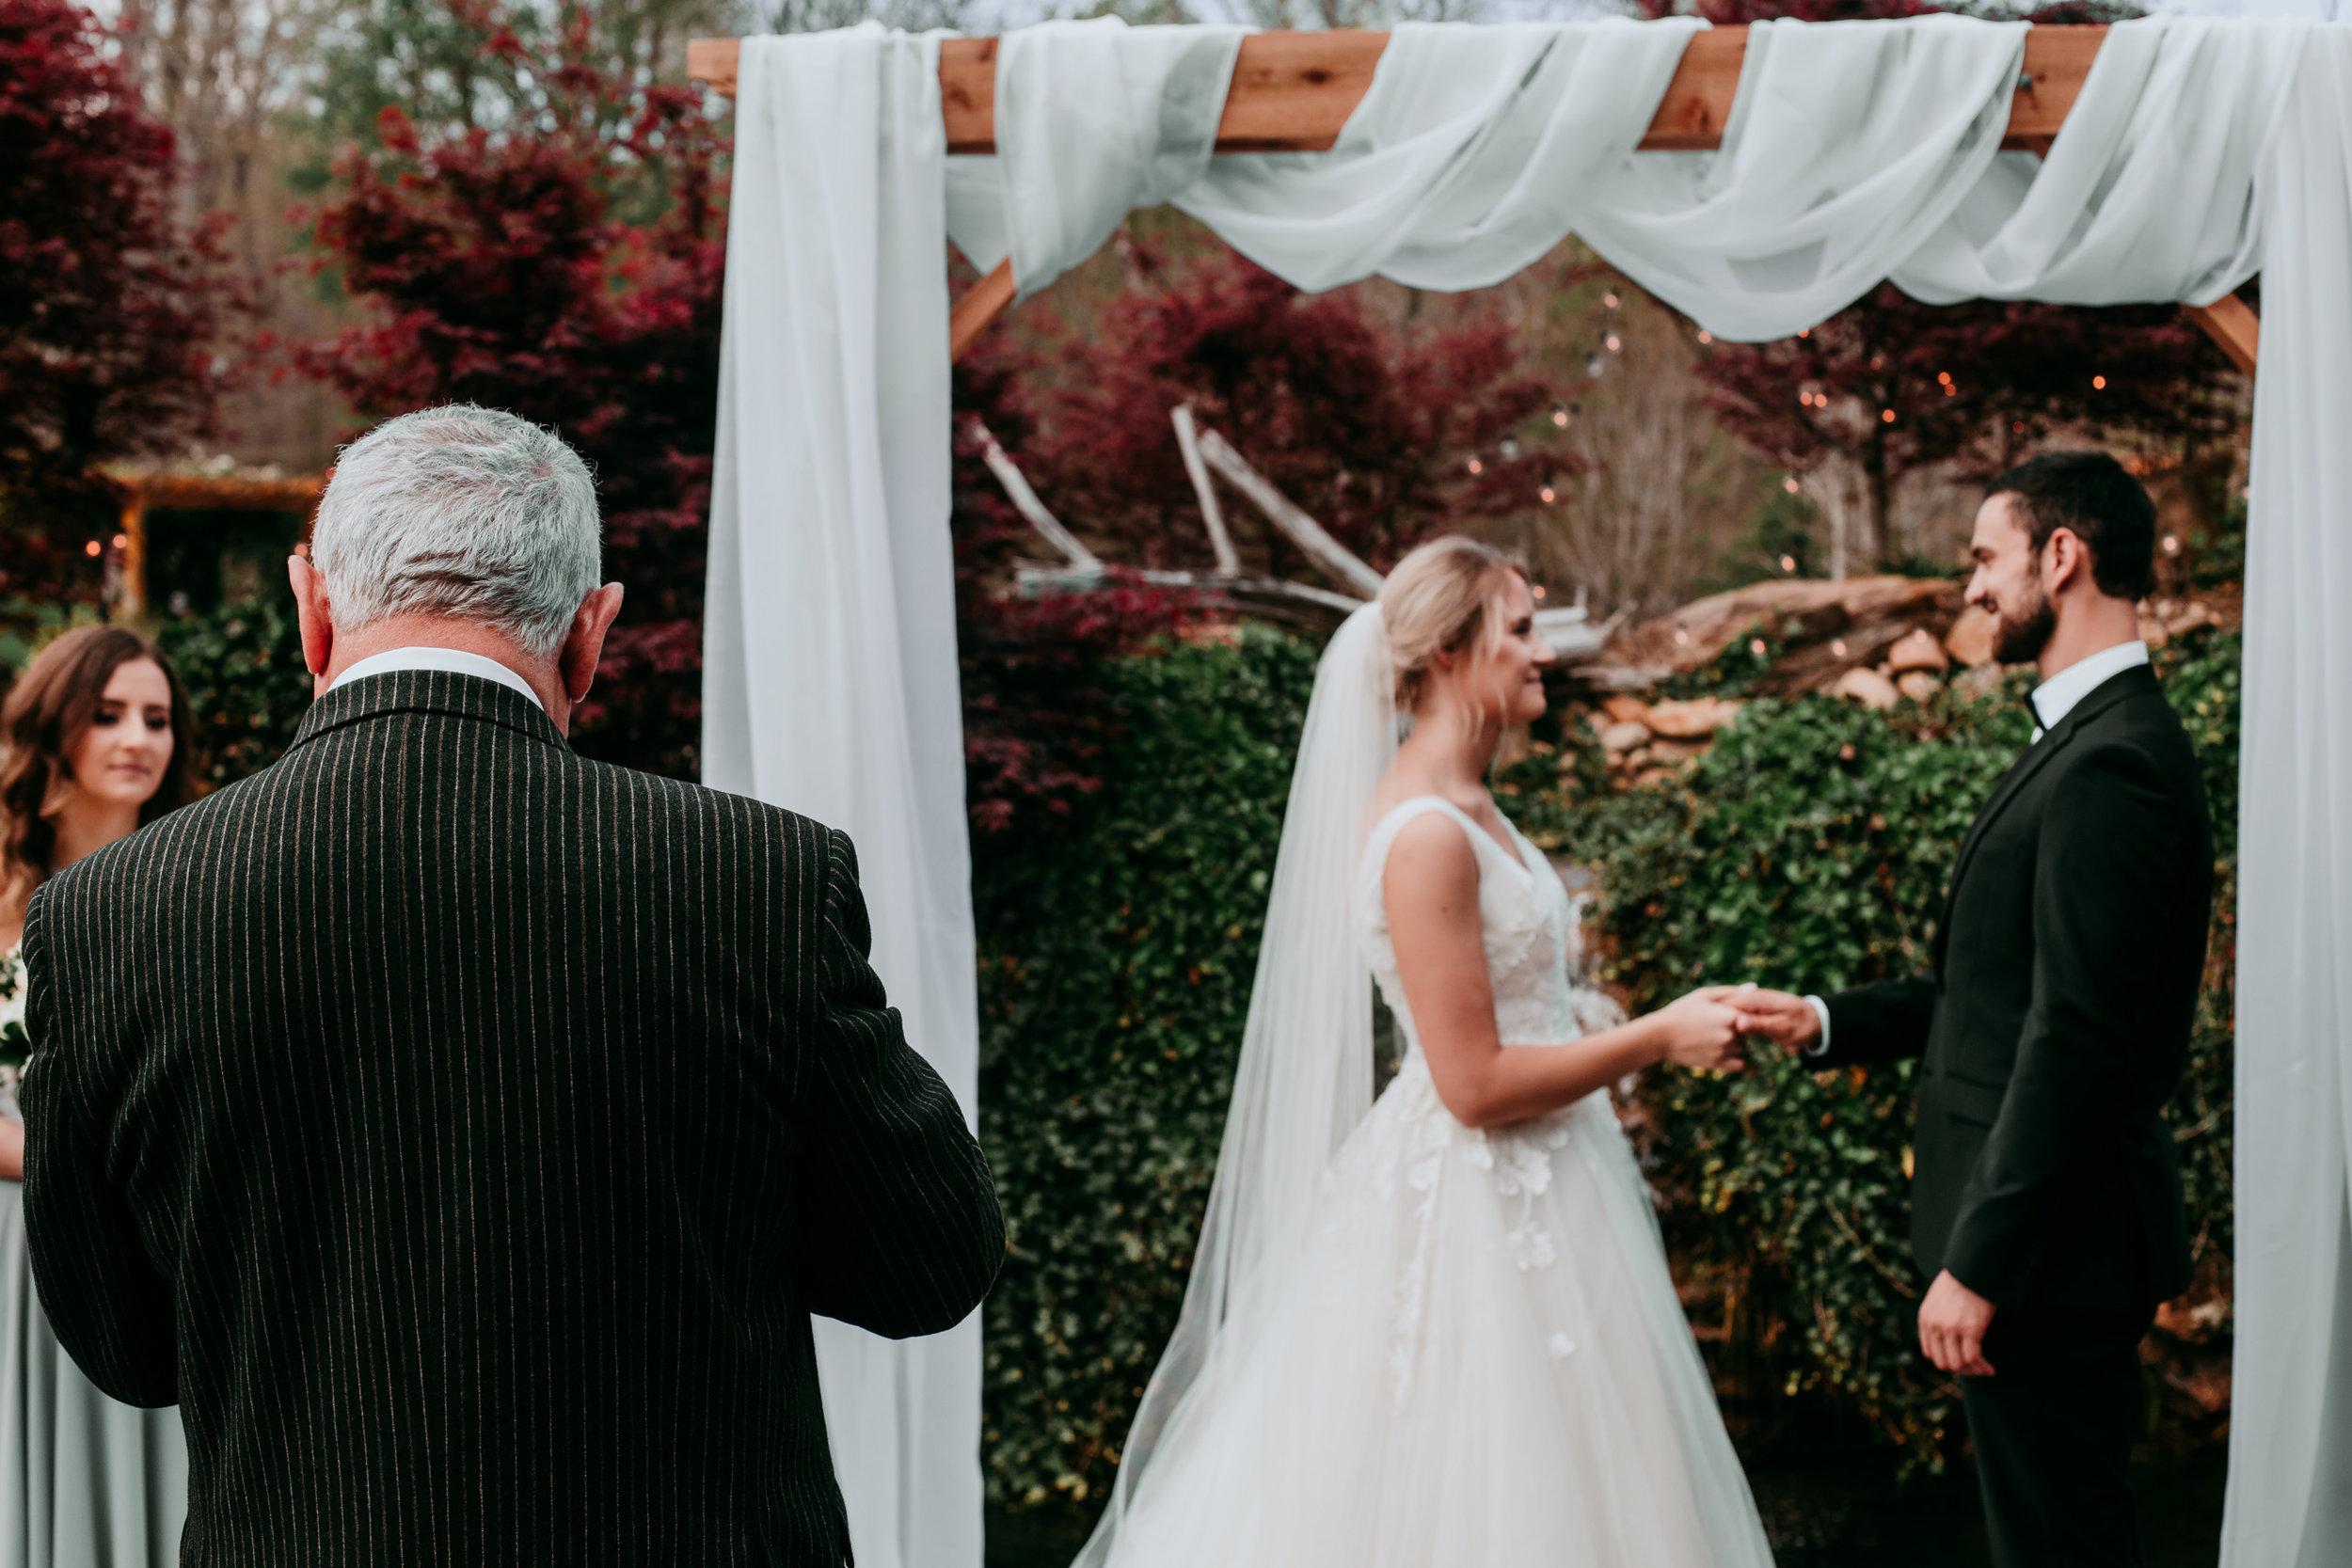 outdoor-wedding-ceremony-ideas.jpg